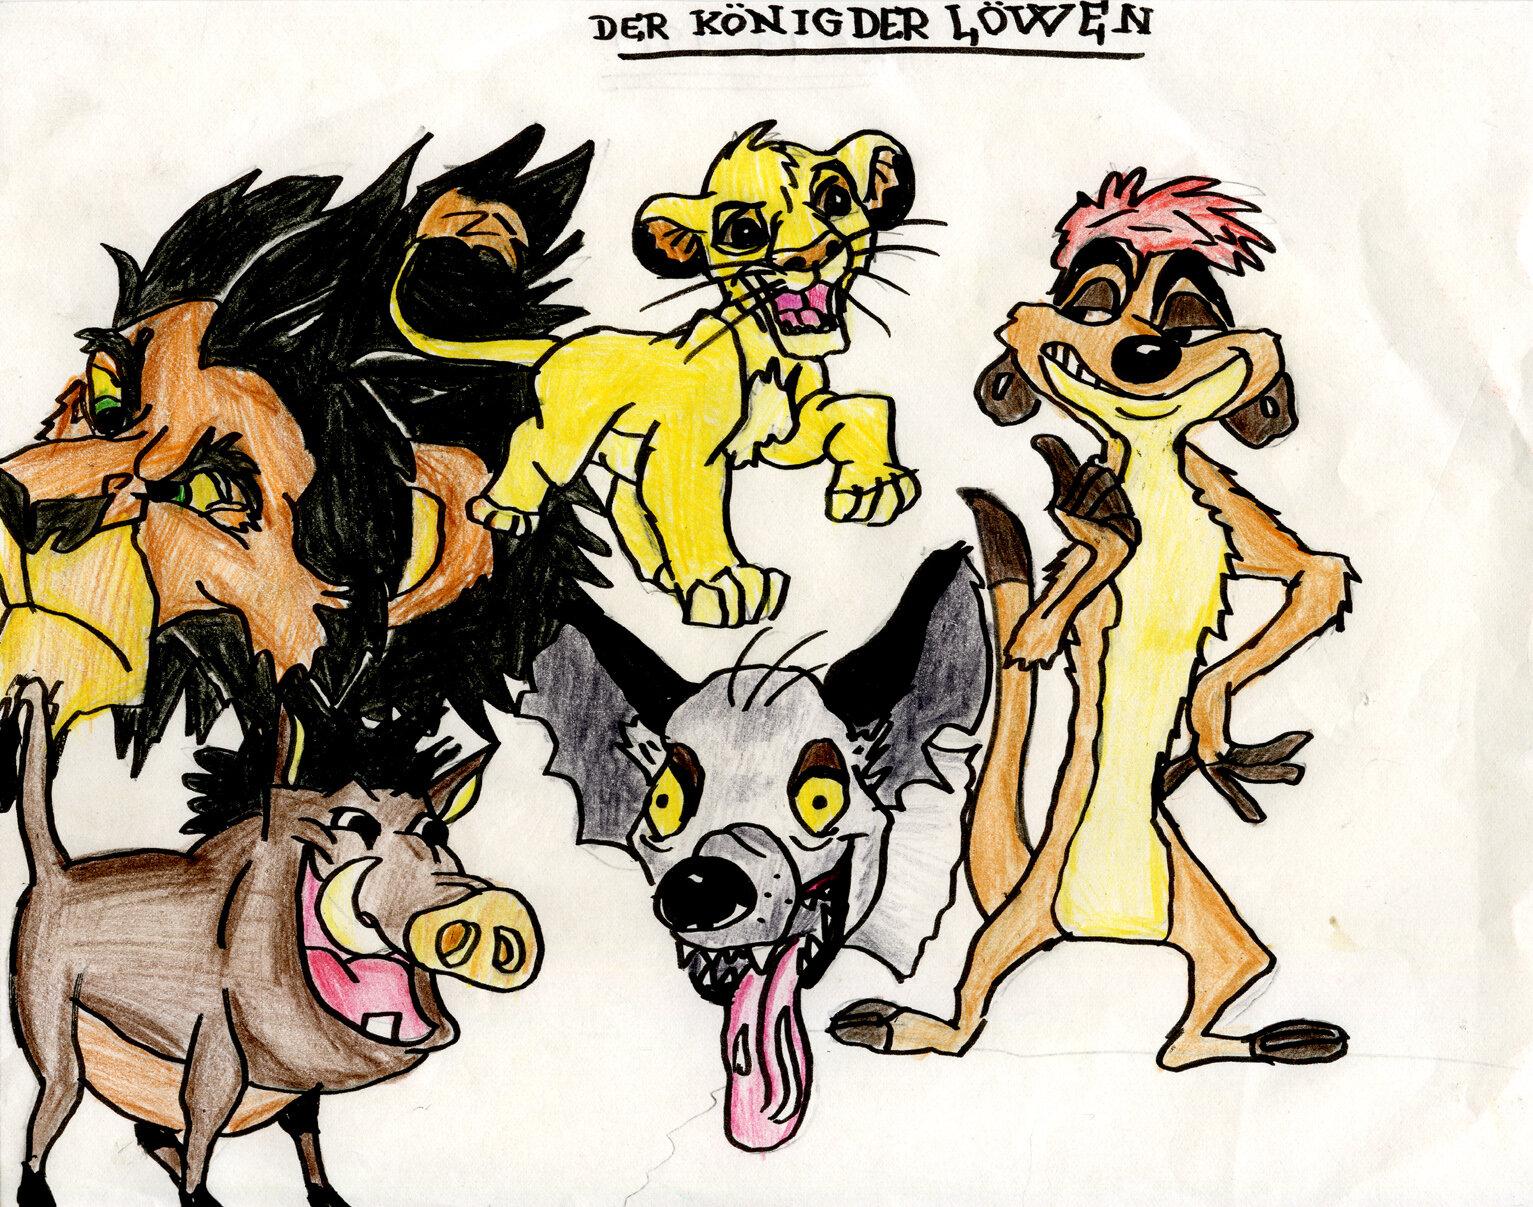 Disney: Der König der Löwen, Charaktere (11/1994)